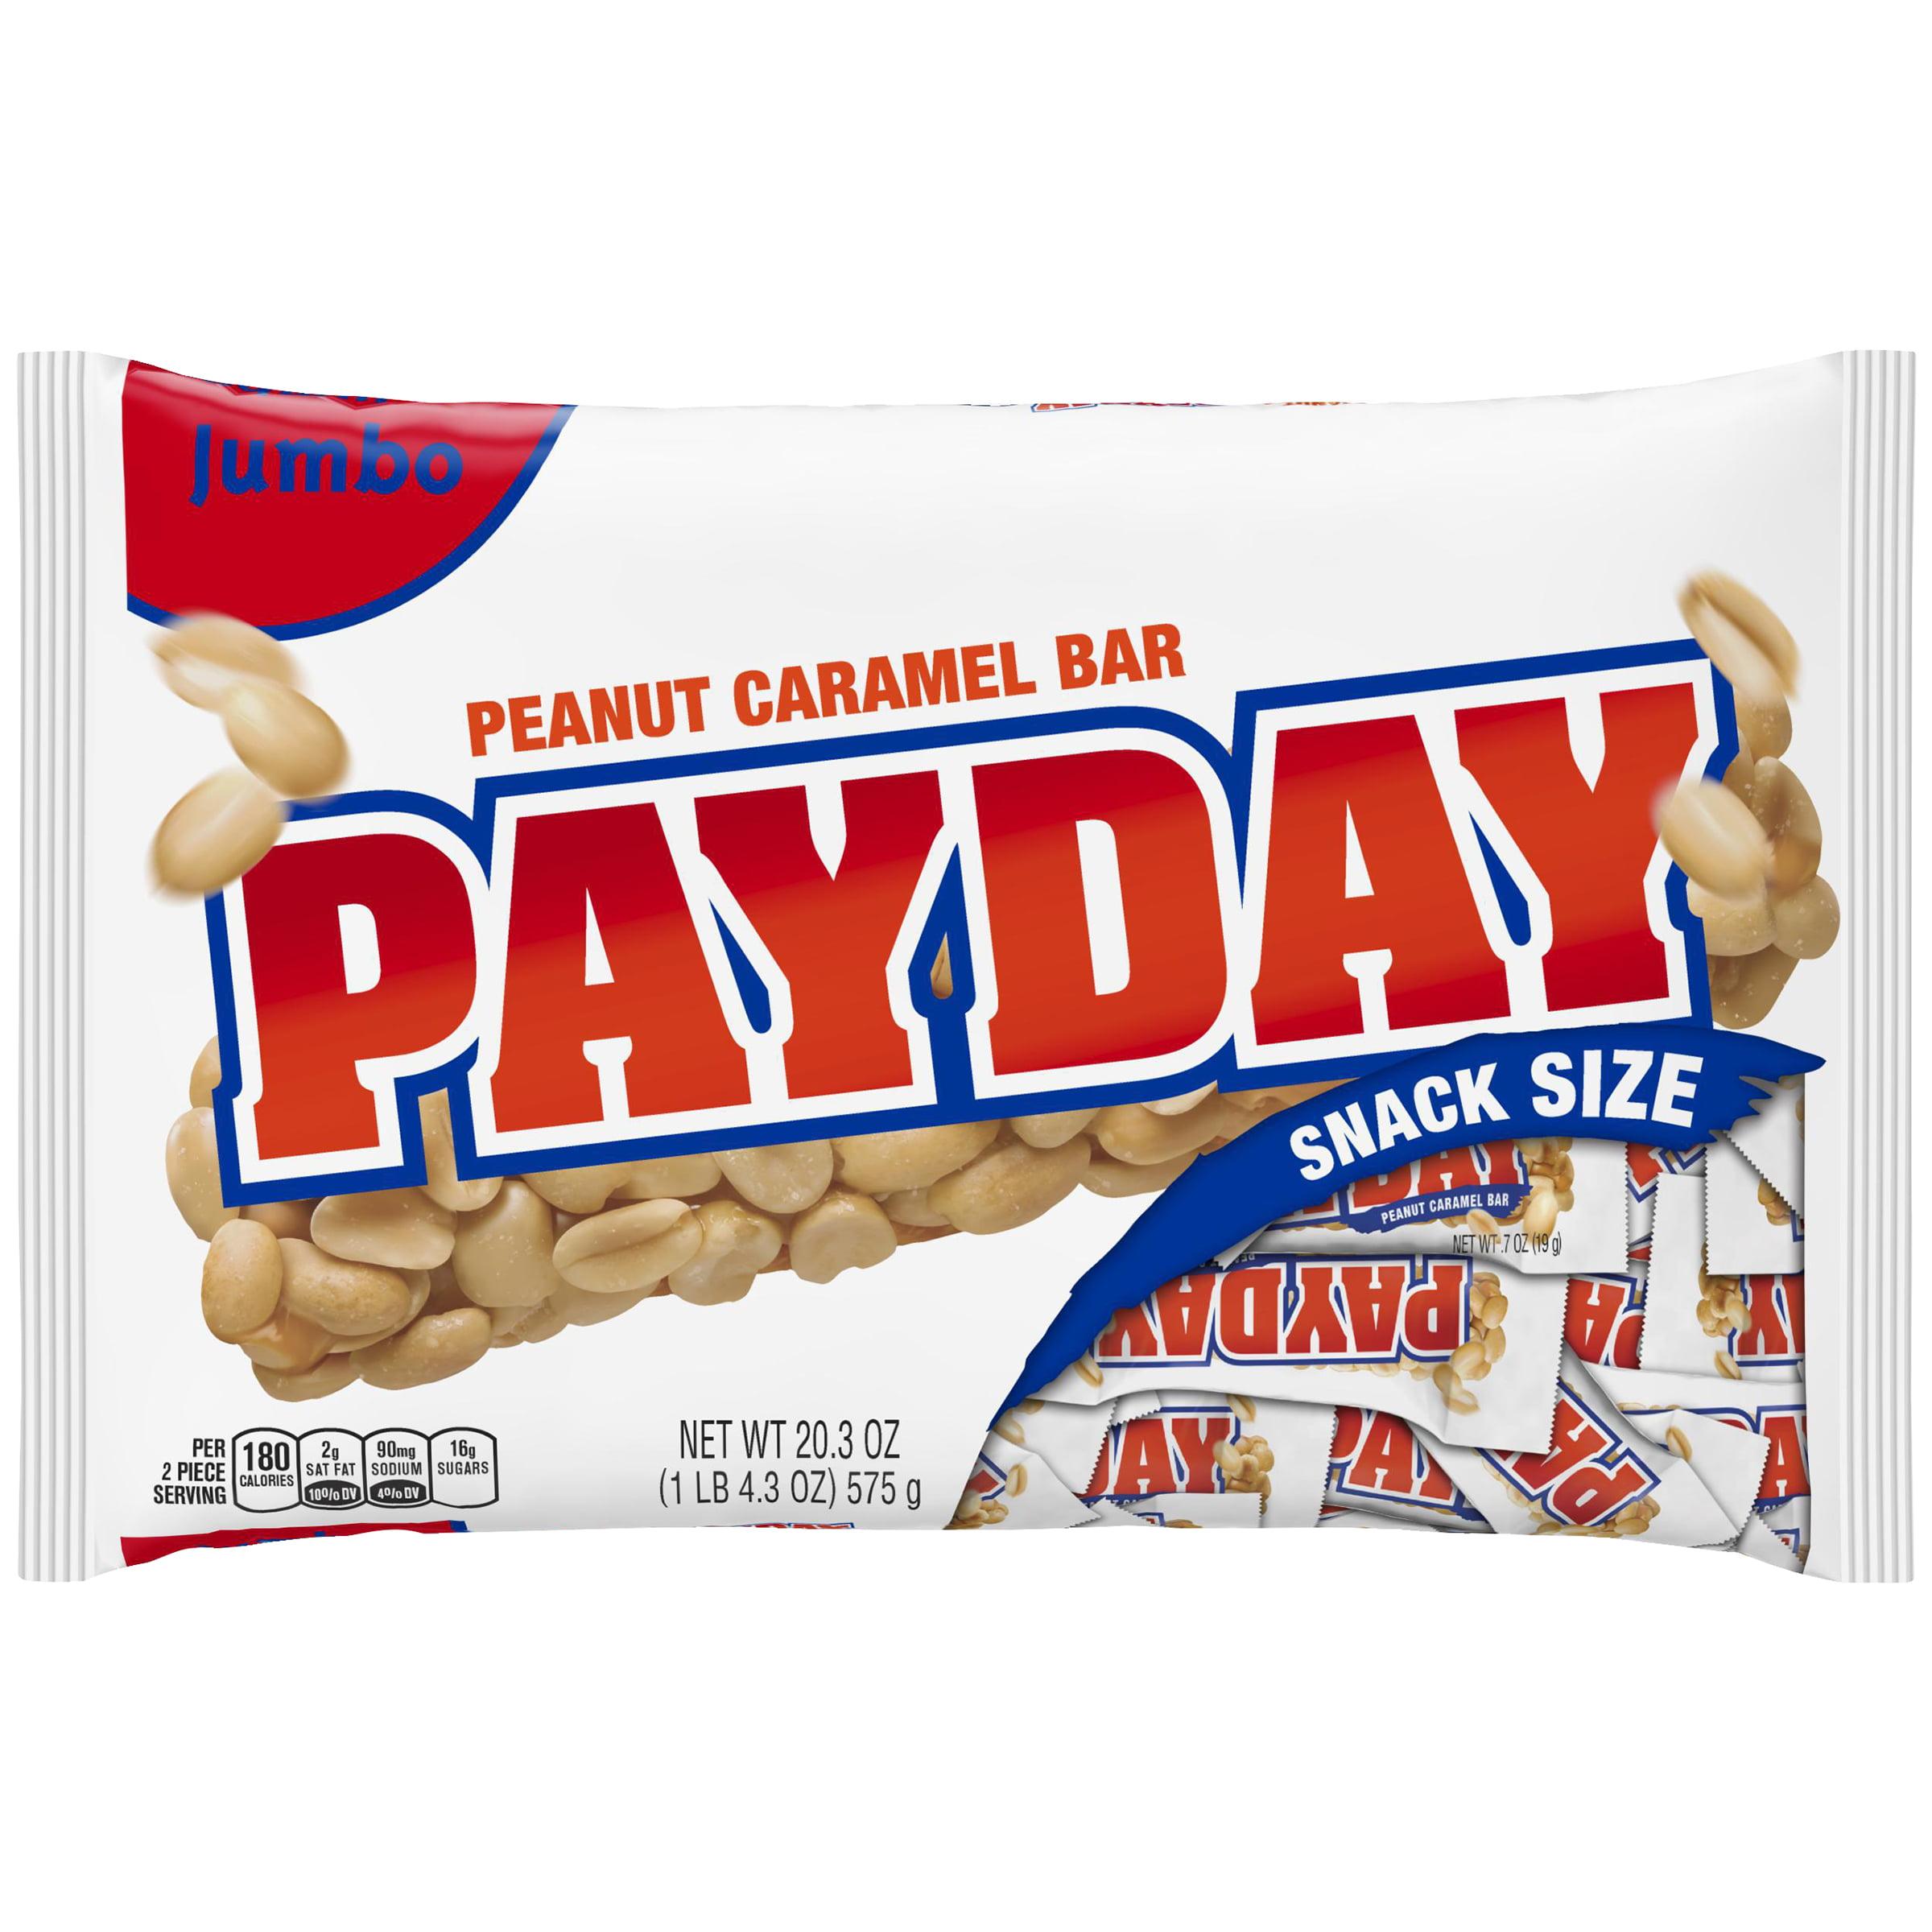 PAYDAY Snack Size Peanut Caramel Bars, 20.3 oz